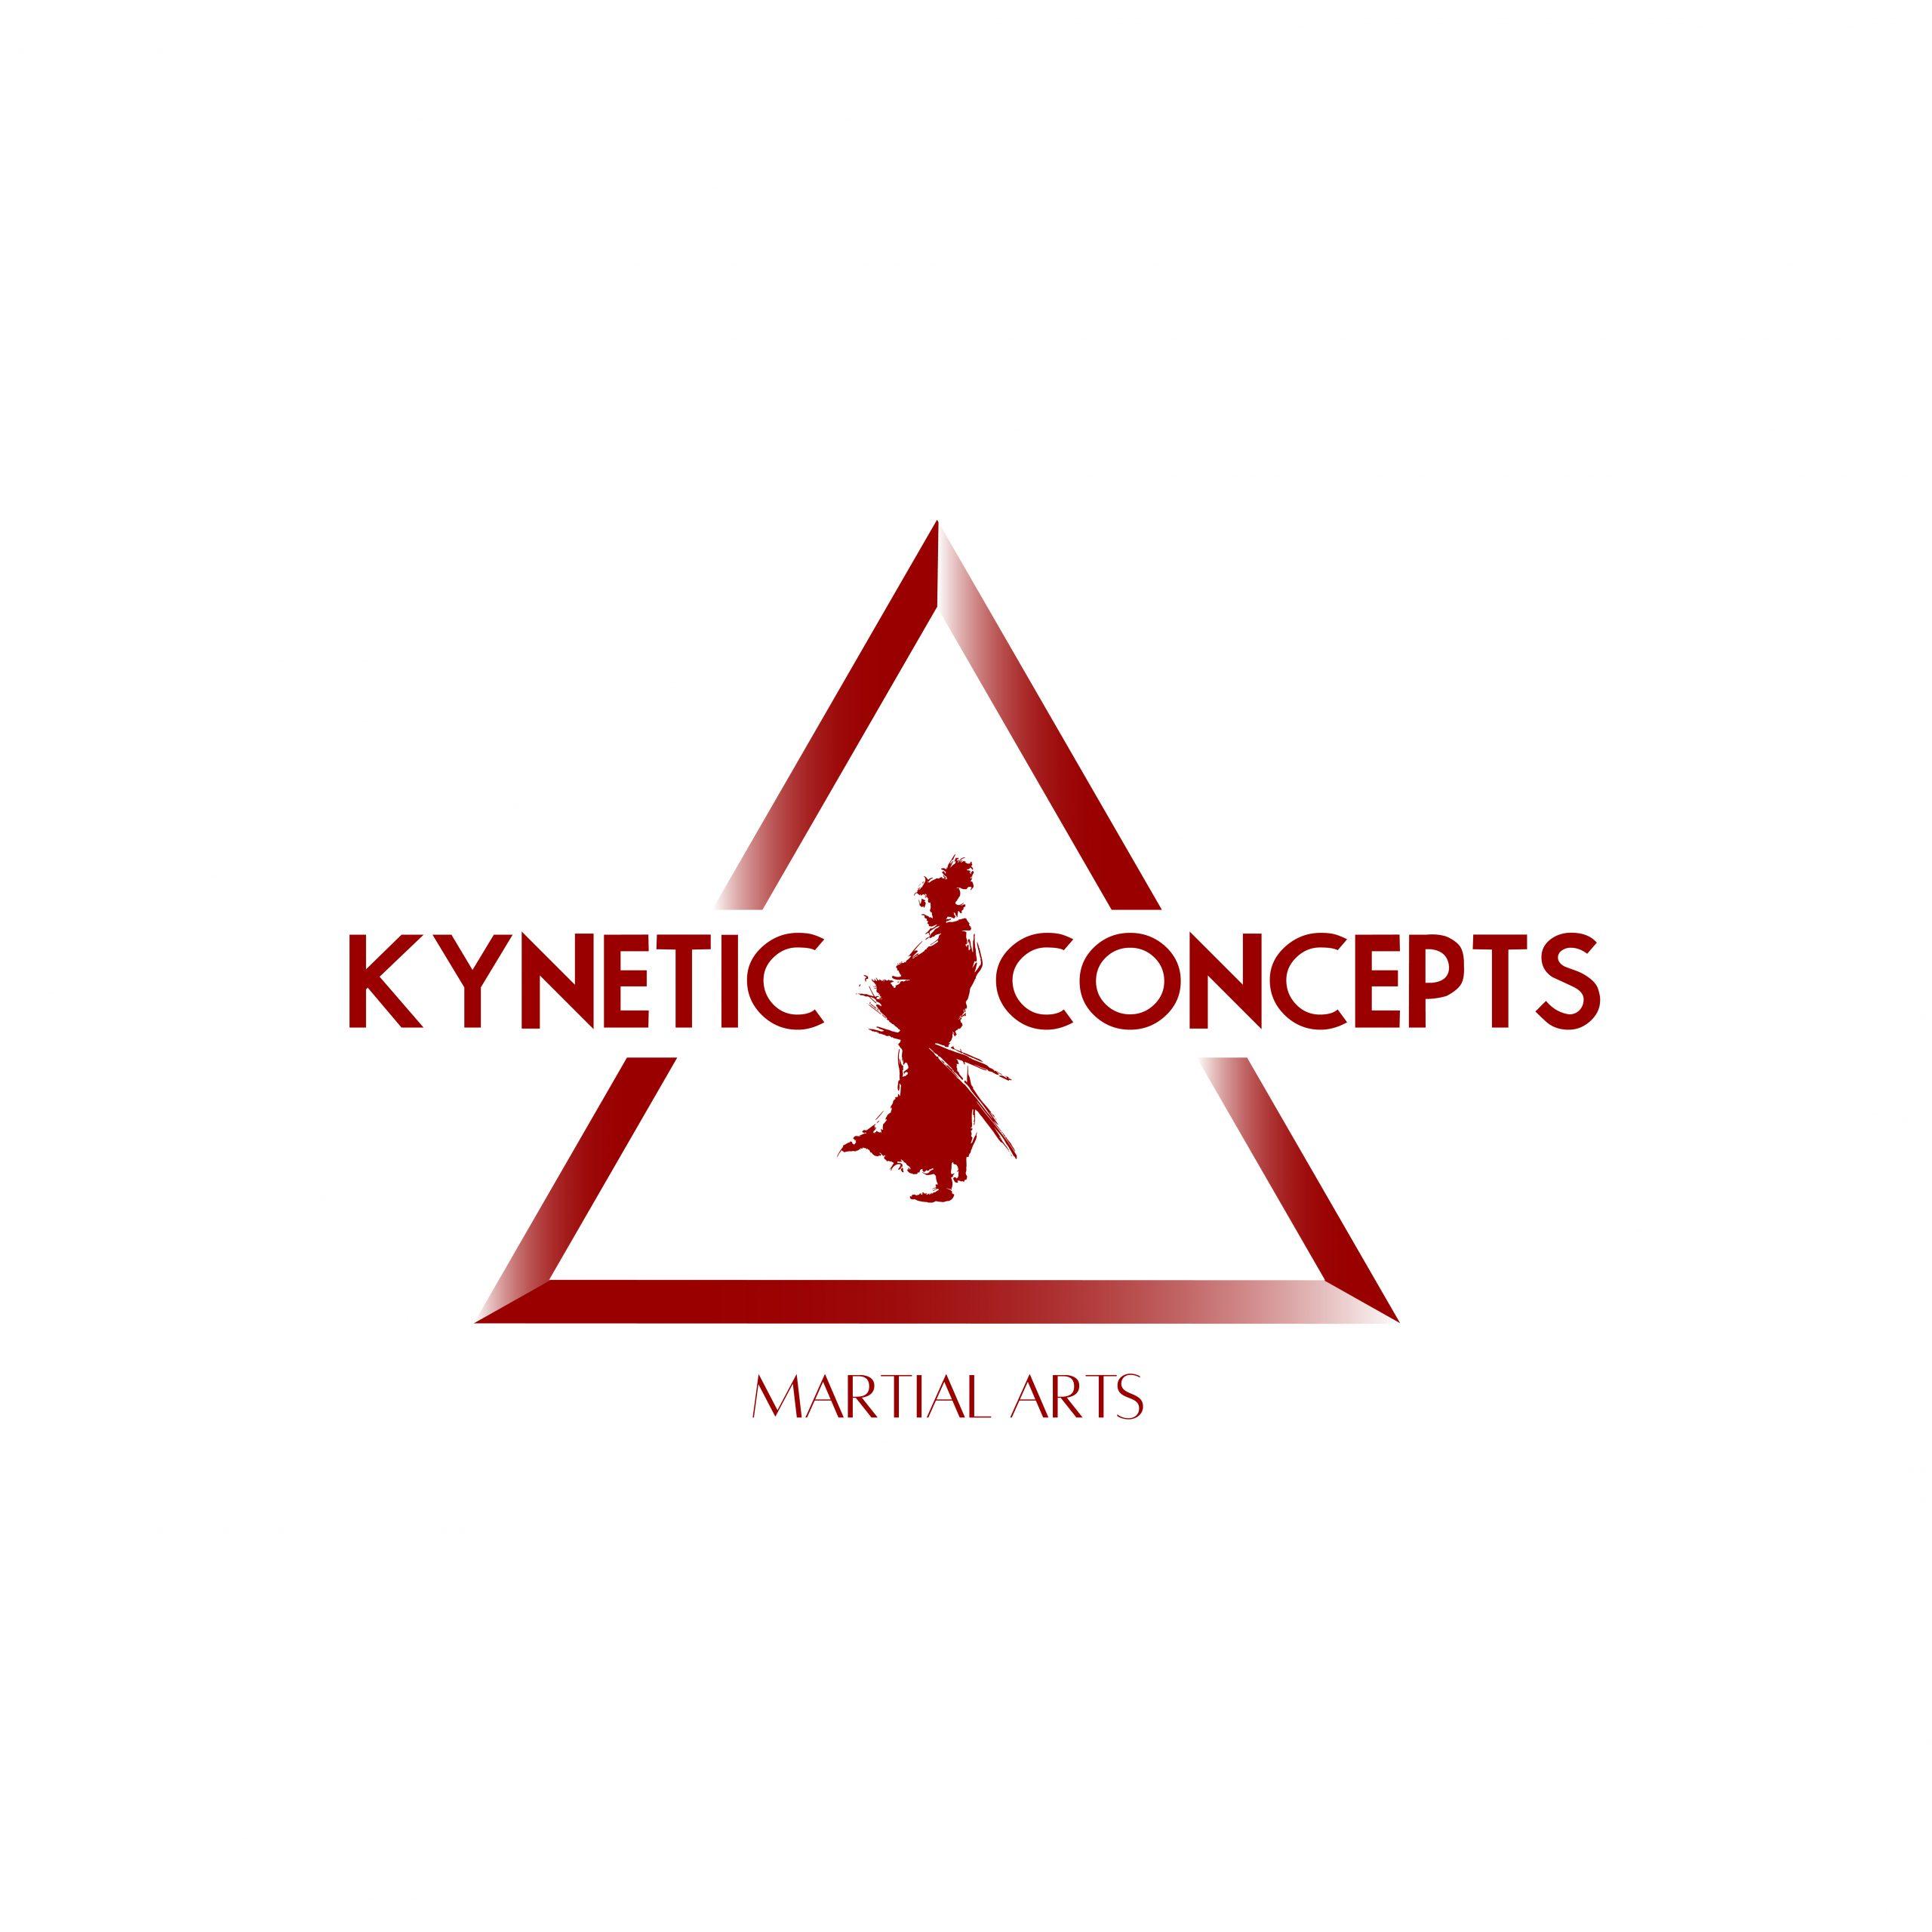 Kynetic-Concepts-Logo-01